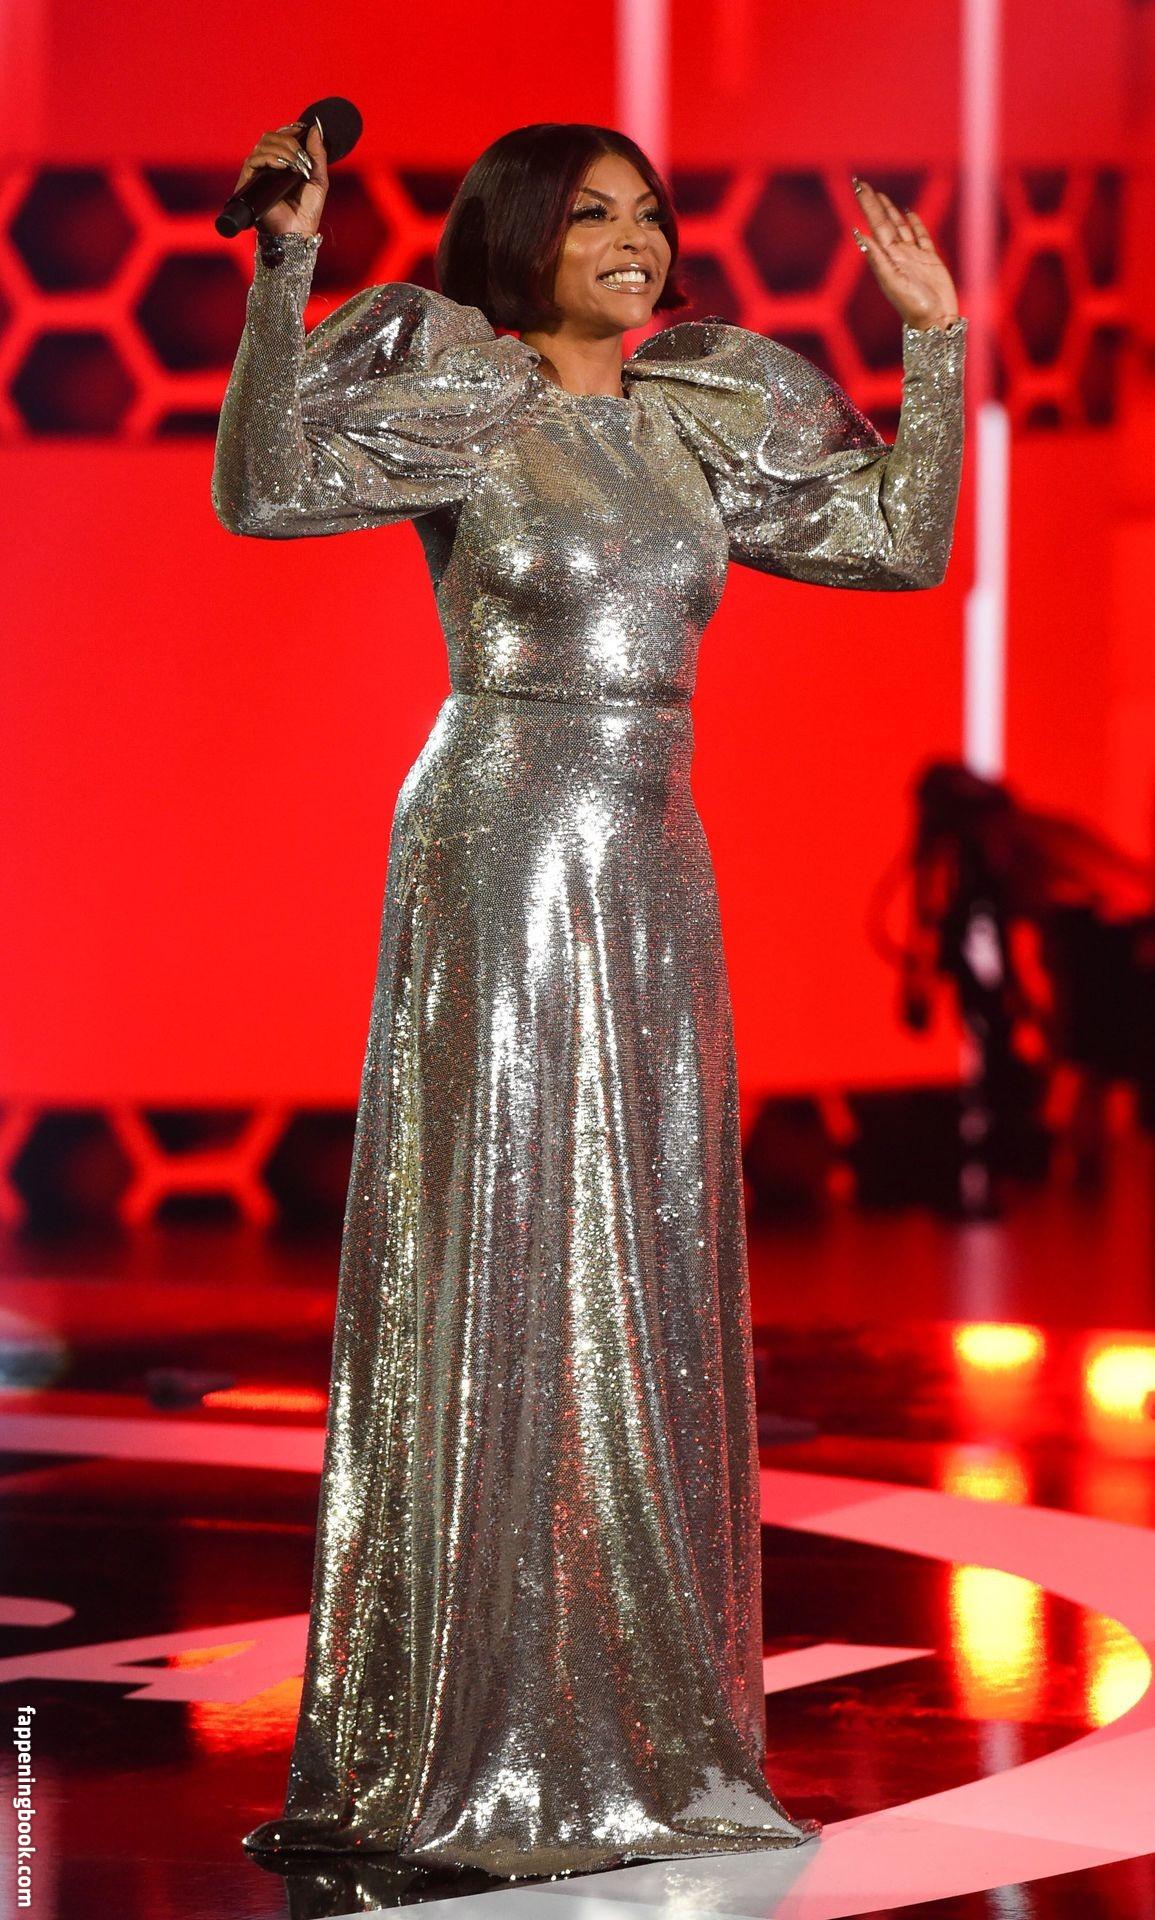 Taraji P. Henson Understands Stunt Risks After Proud Mary